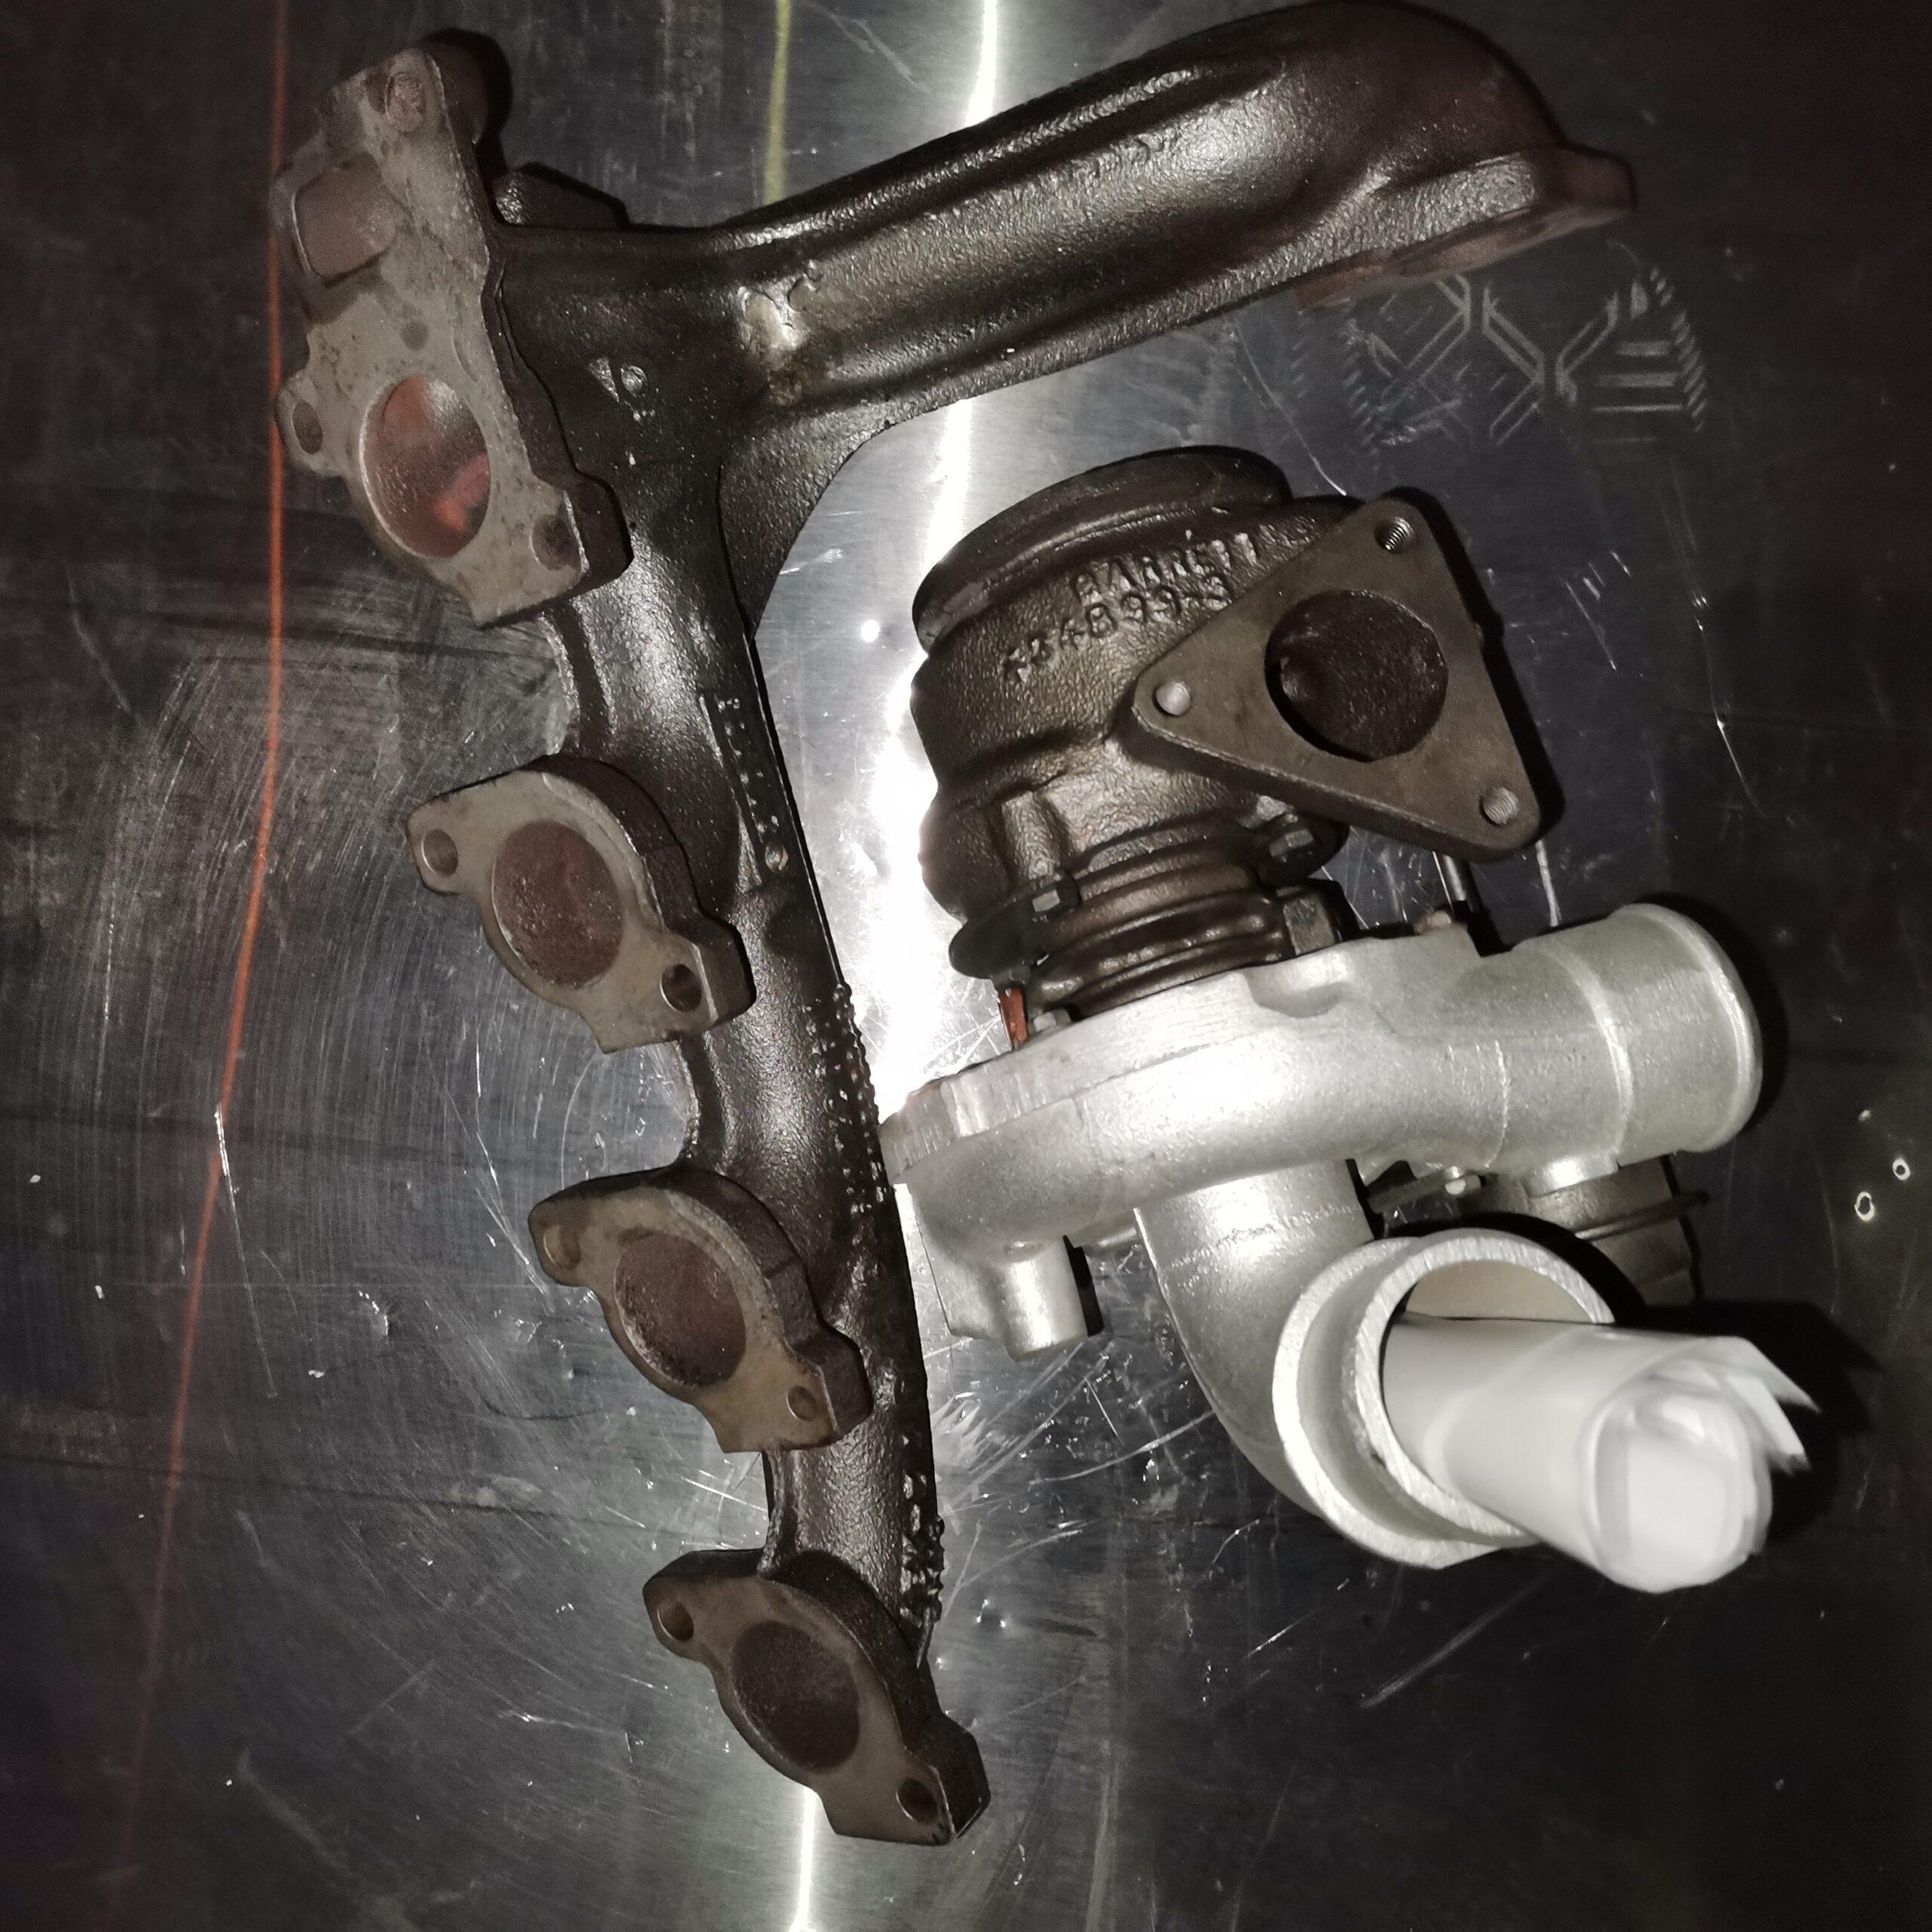 Турбокомпрессор Mercedes Vito 2.2 л. после ремонта в turboday